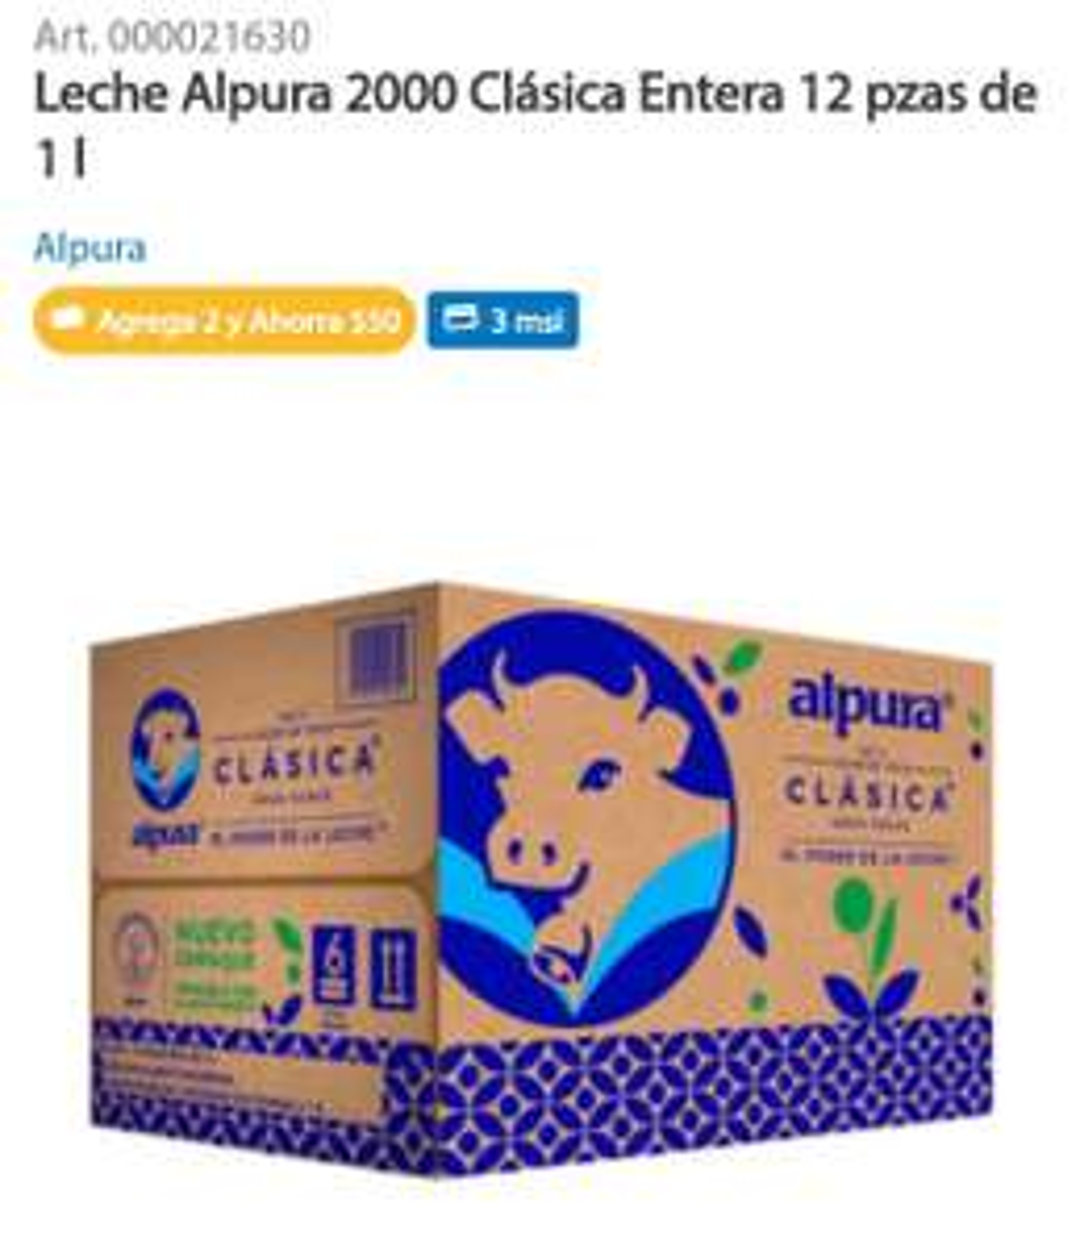 Sam's Club: Leche Alpura Entera 2000 (Precio por litro al comprar dos paquetes de 12L)